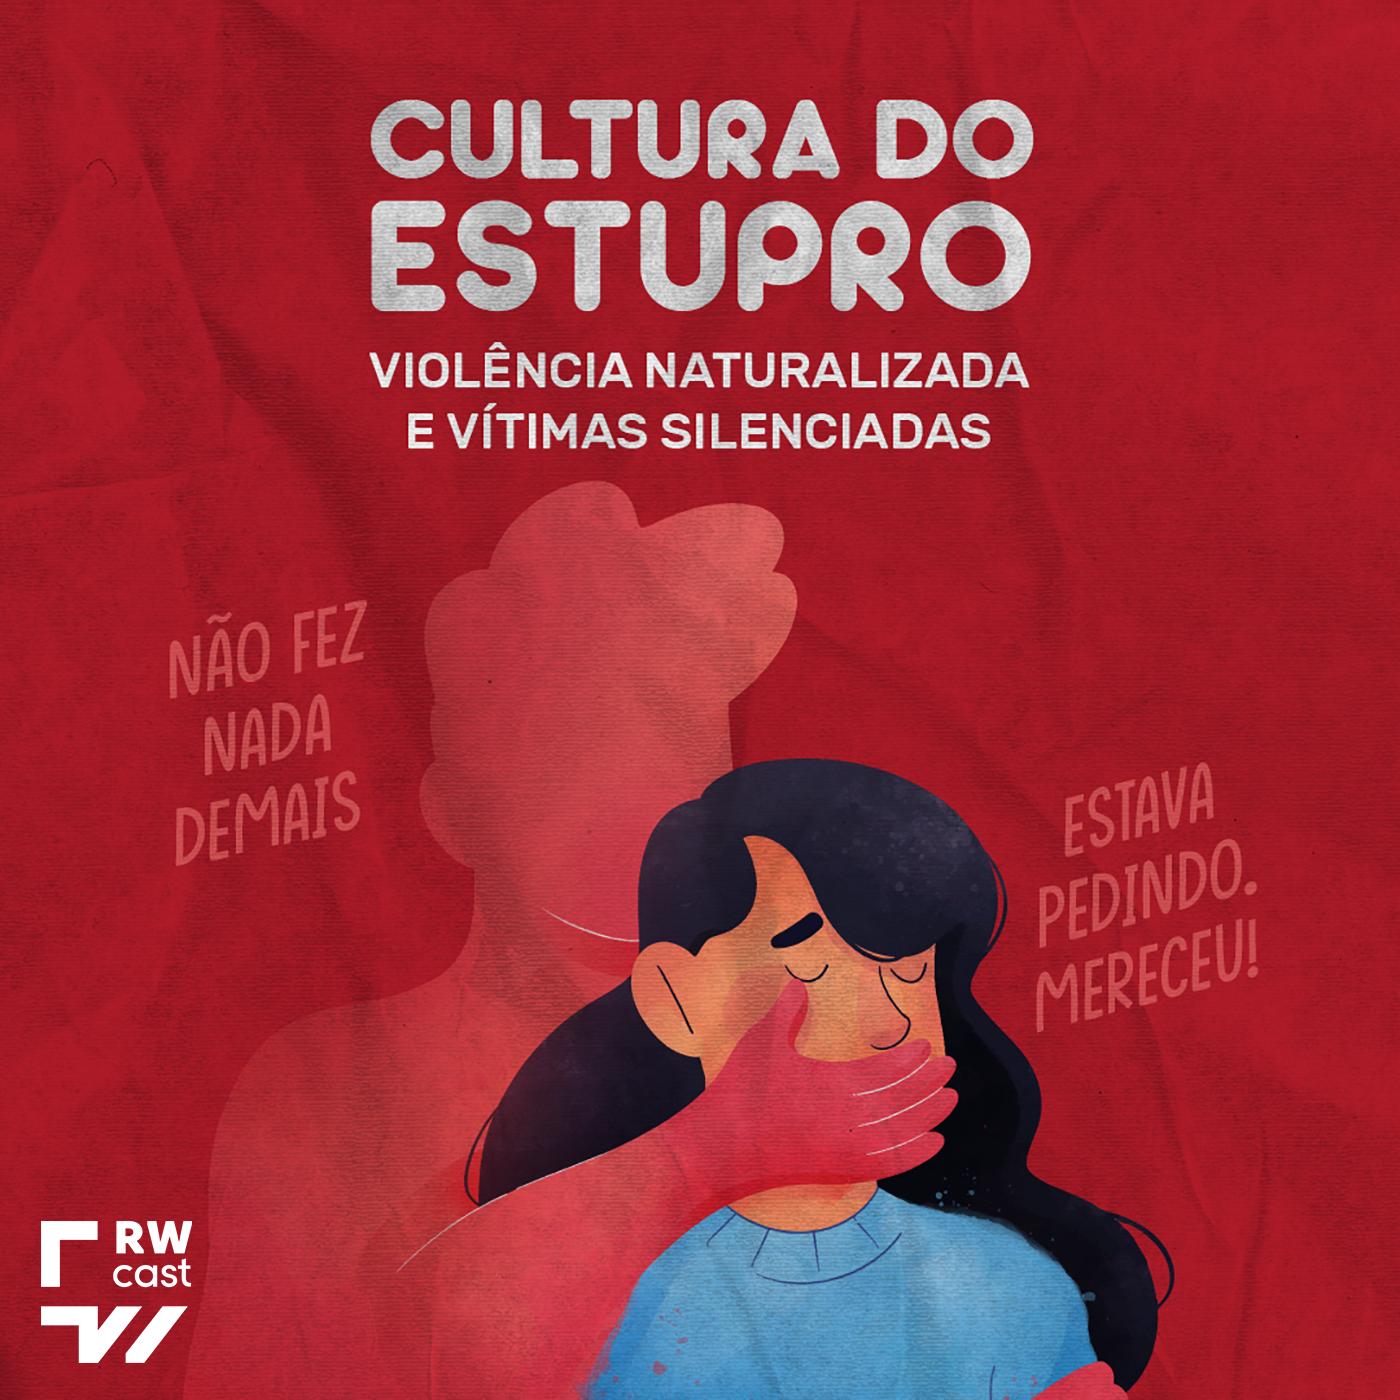 Cultura do estupro: violência naturalizada e vítimas silenciadas